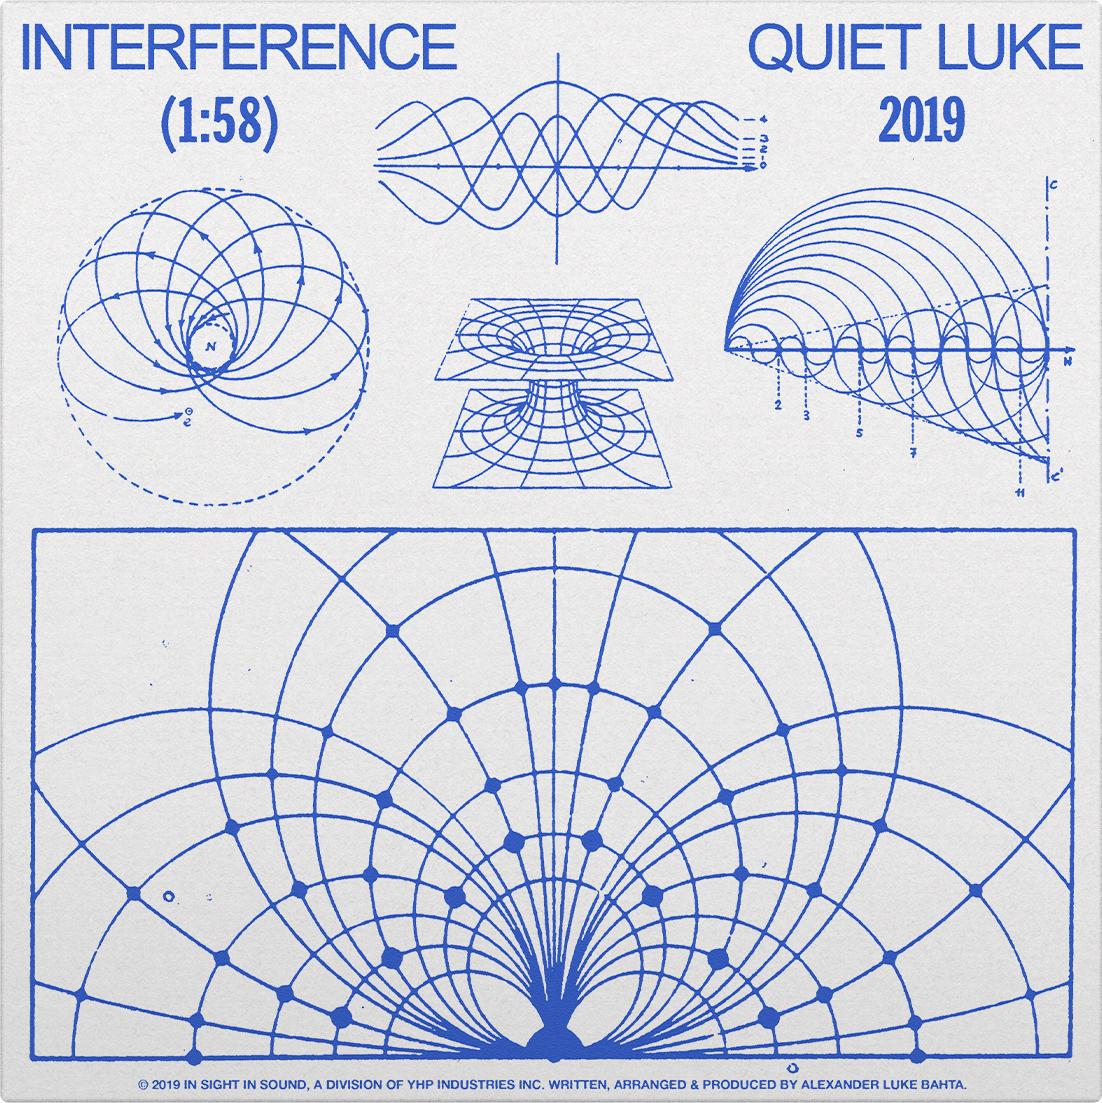 interference vinyl.jpg